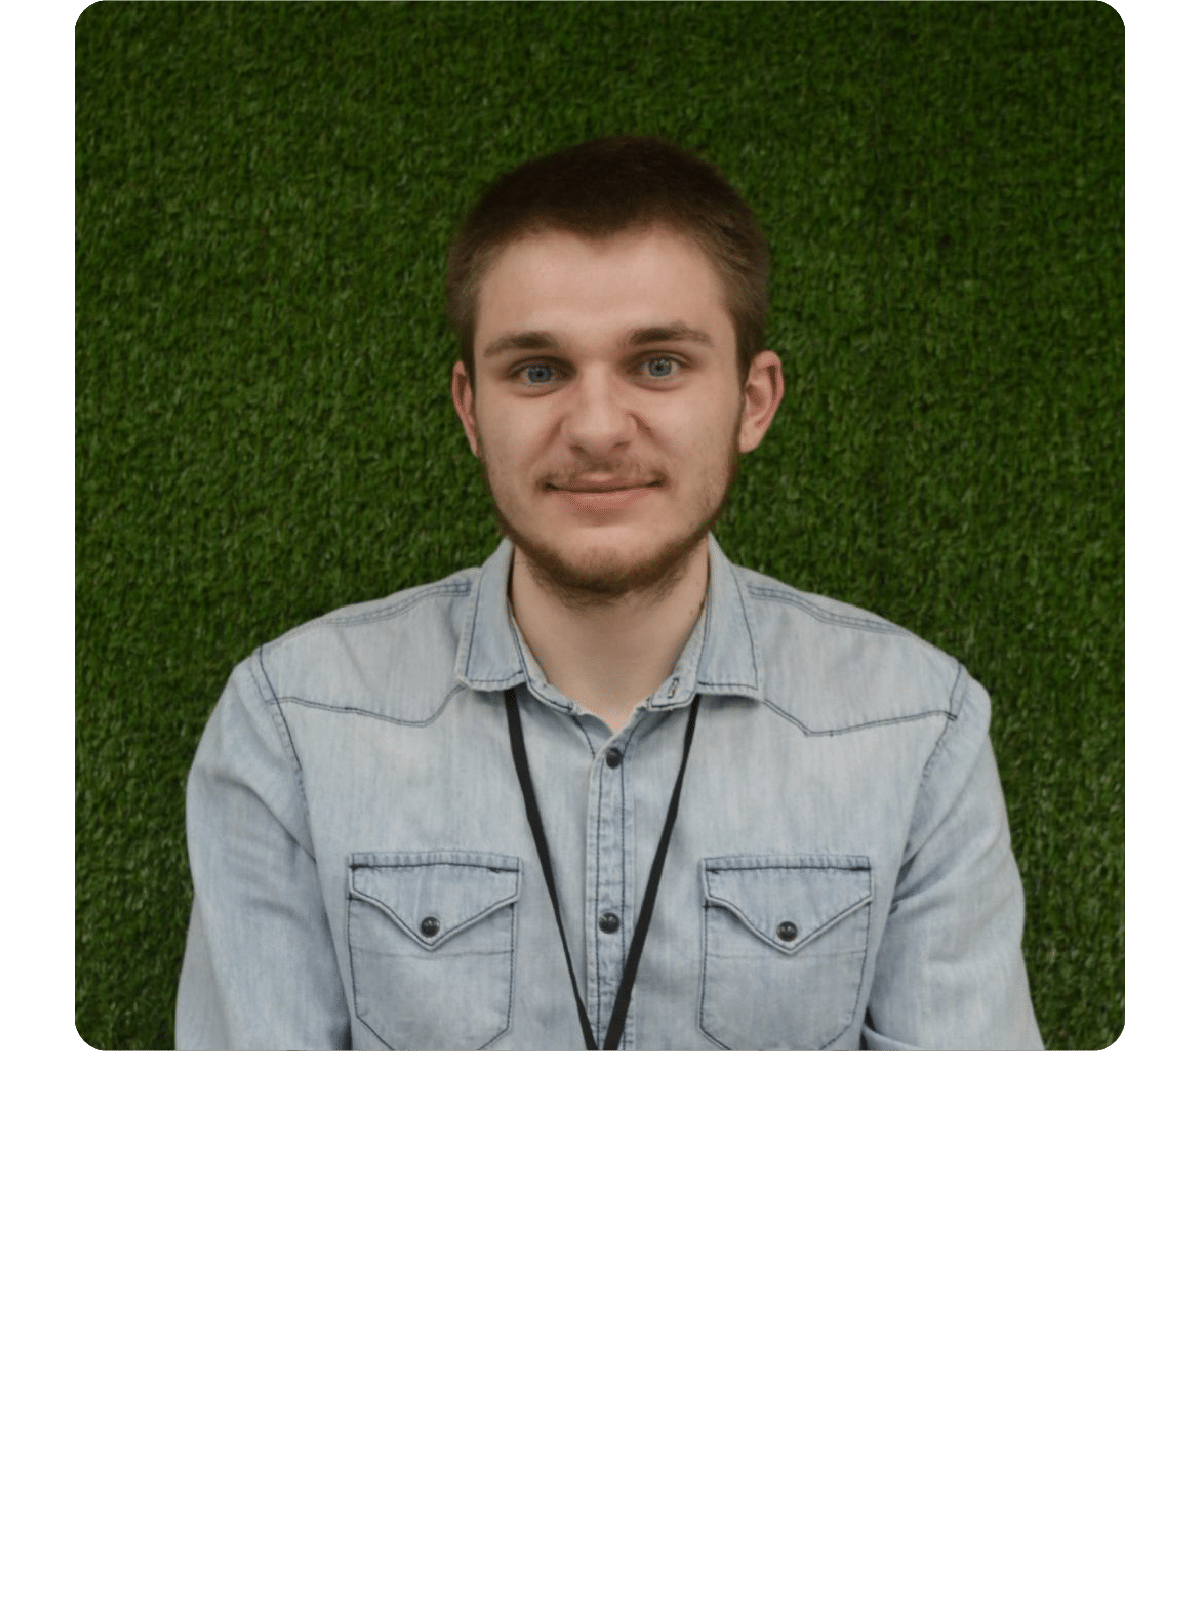 Miljan Simonović